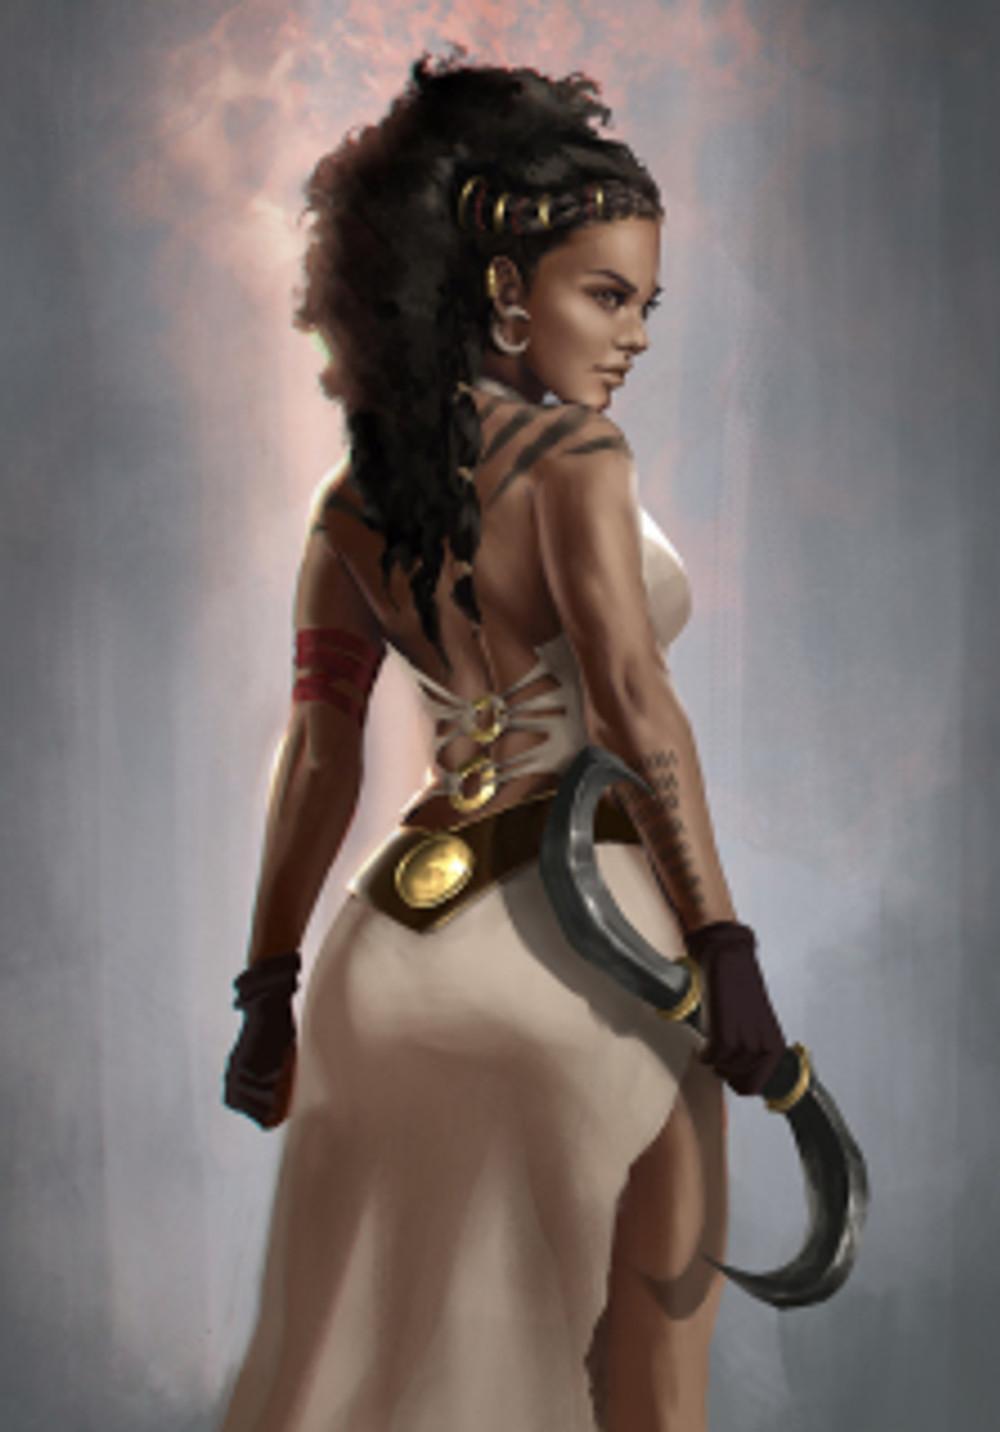 арт-девушка-красивые-картинки-fan-art-Dothraki-2765794